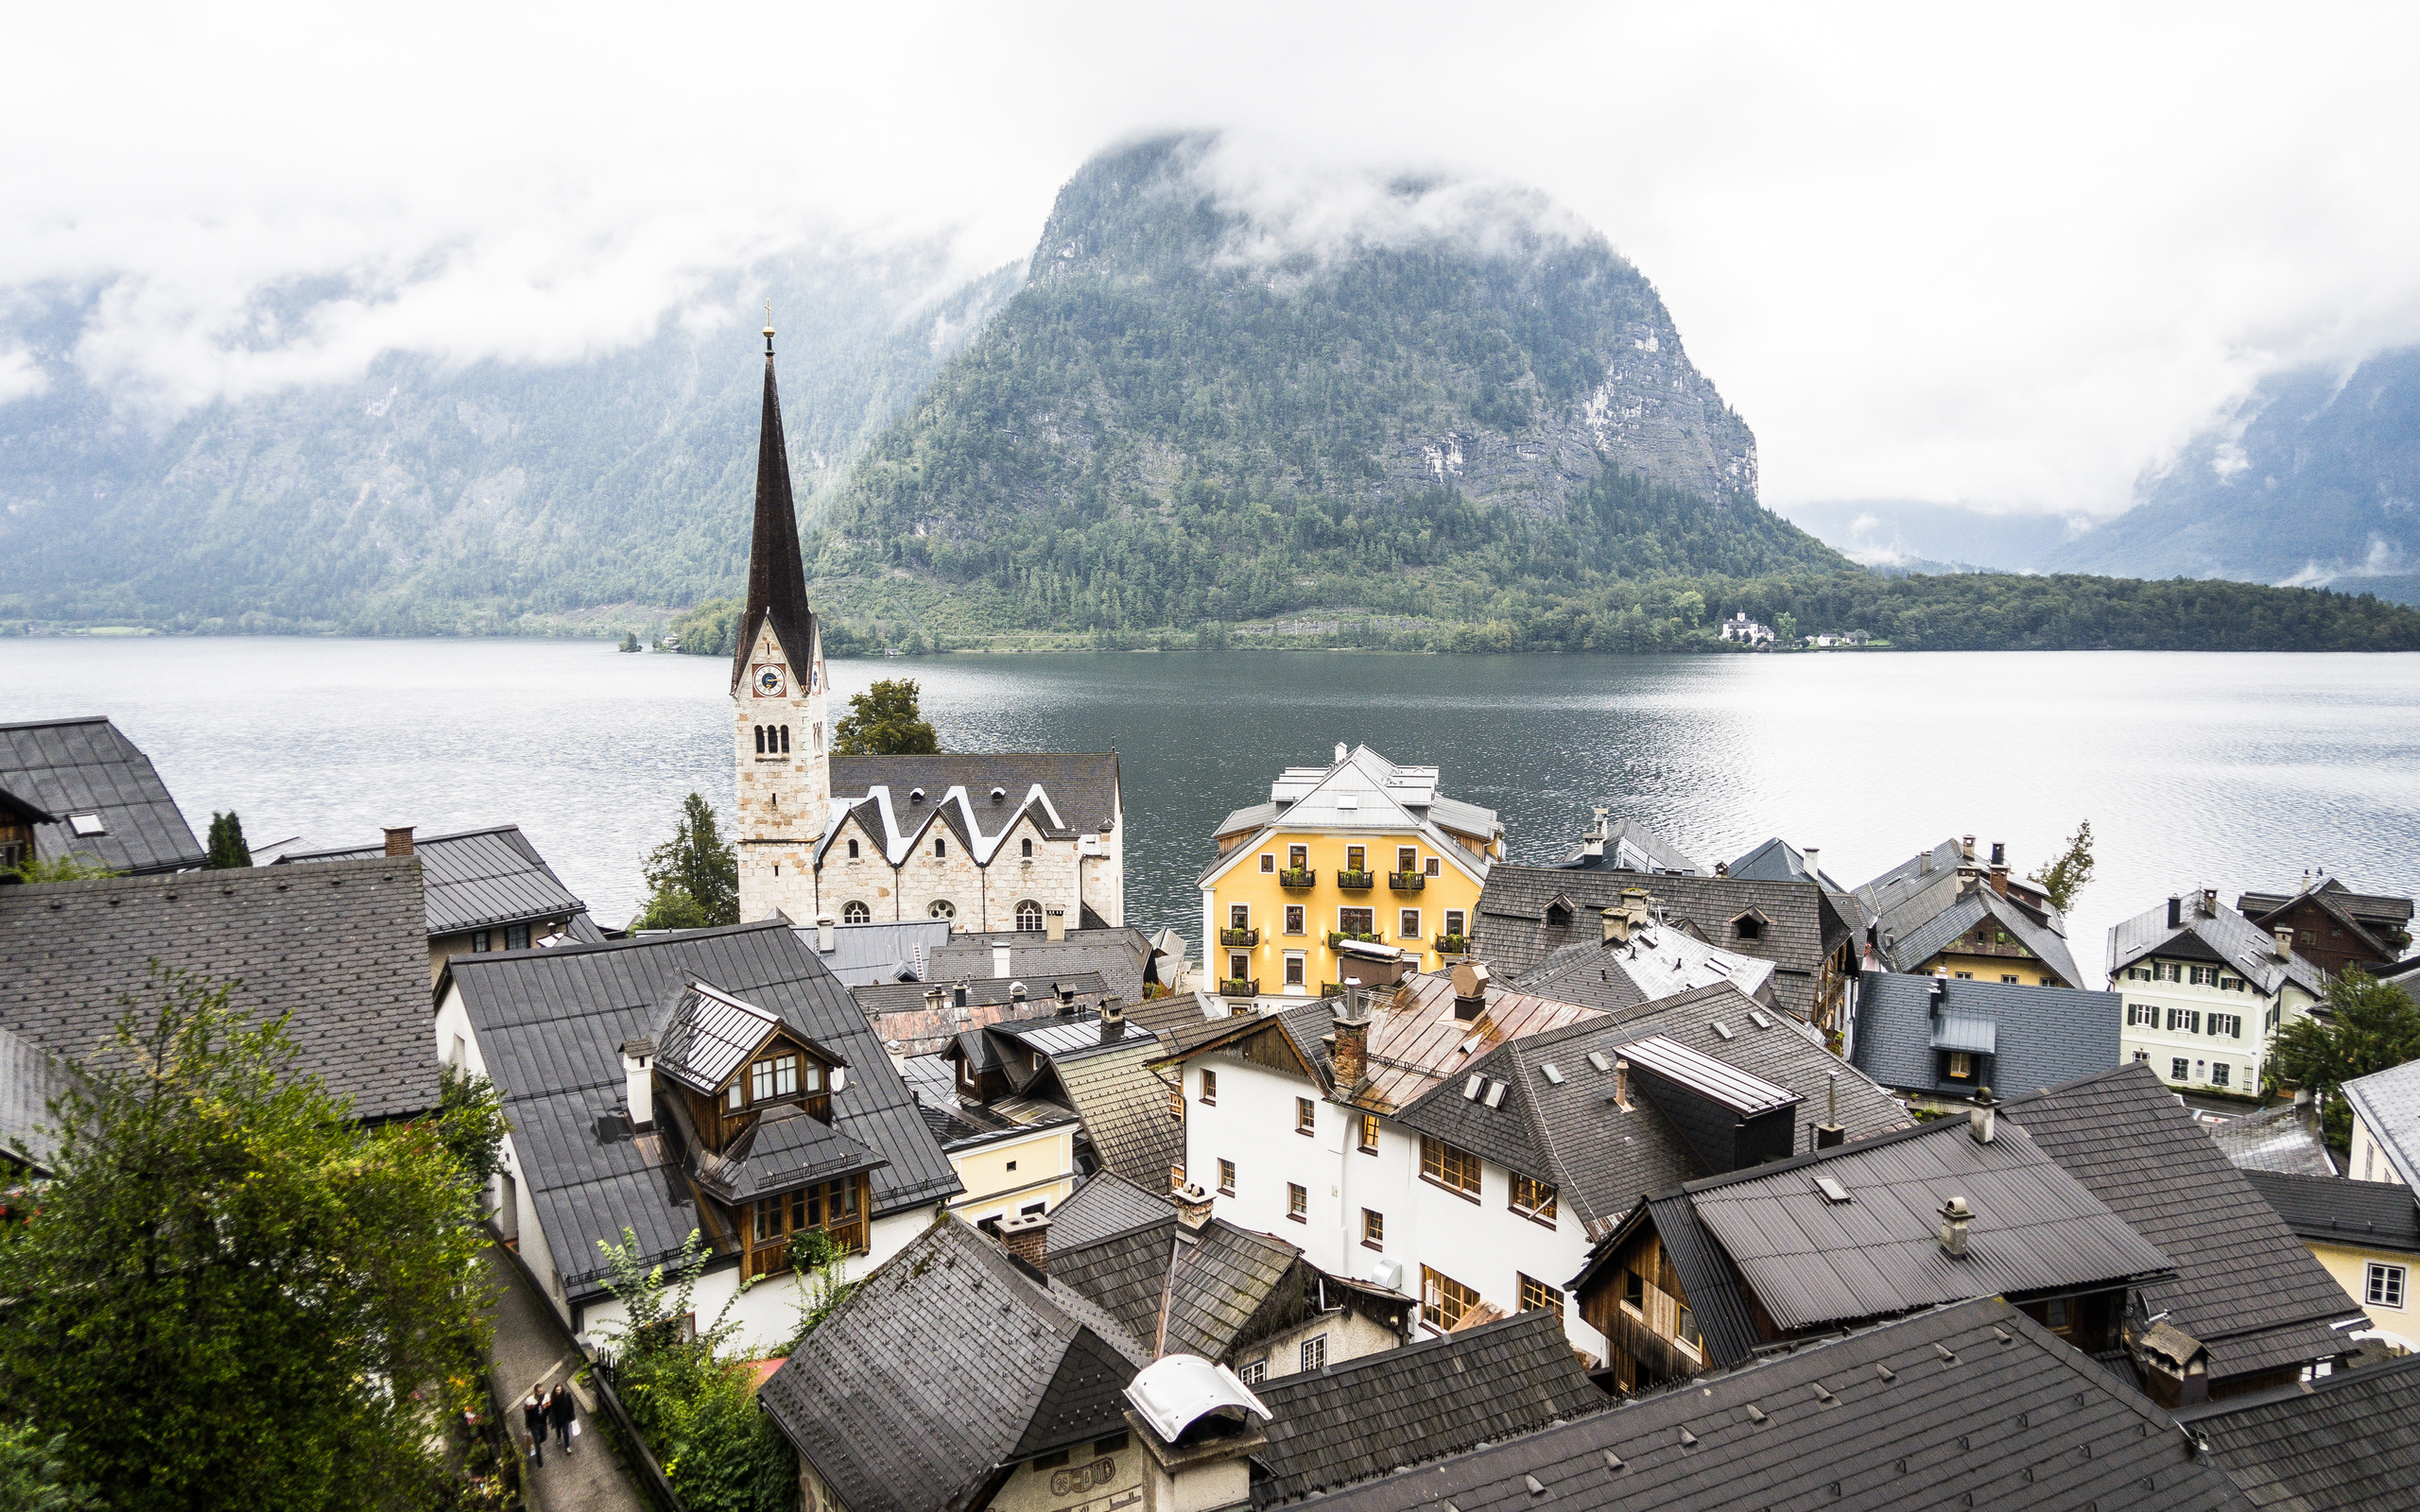 австрия, озеро, горы, туман, церковь, халльштатт